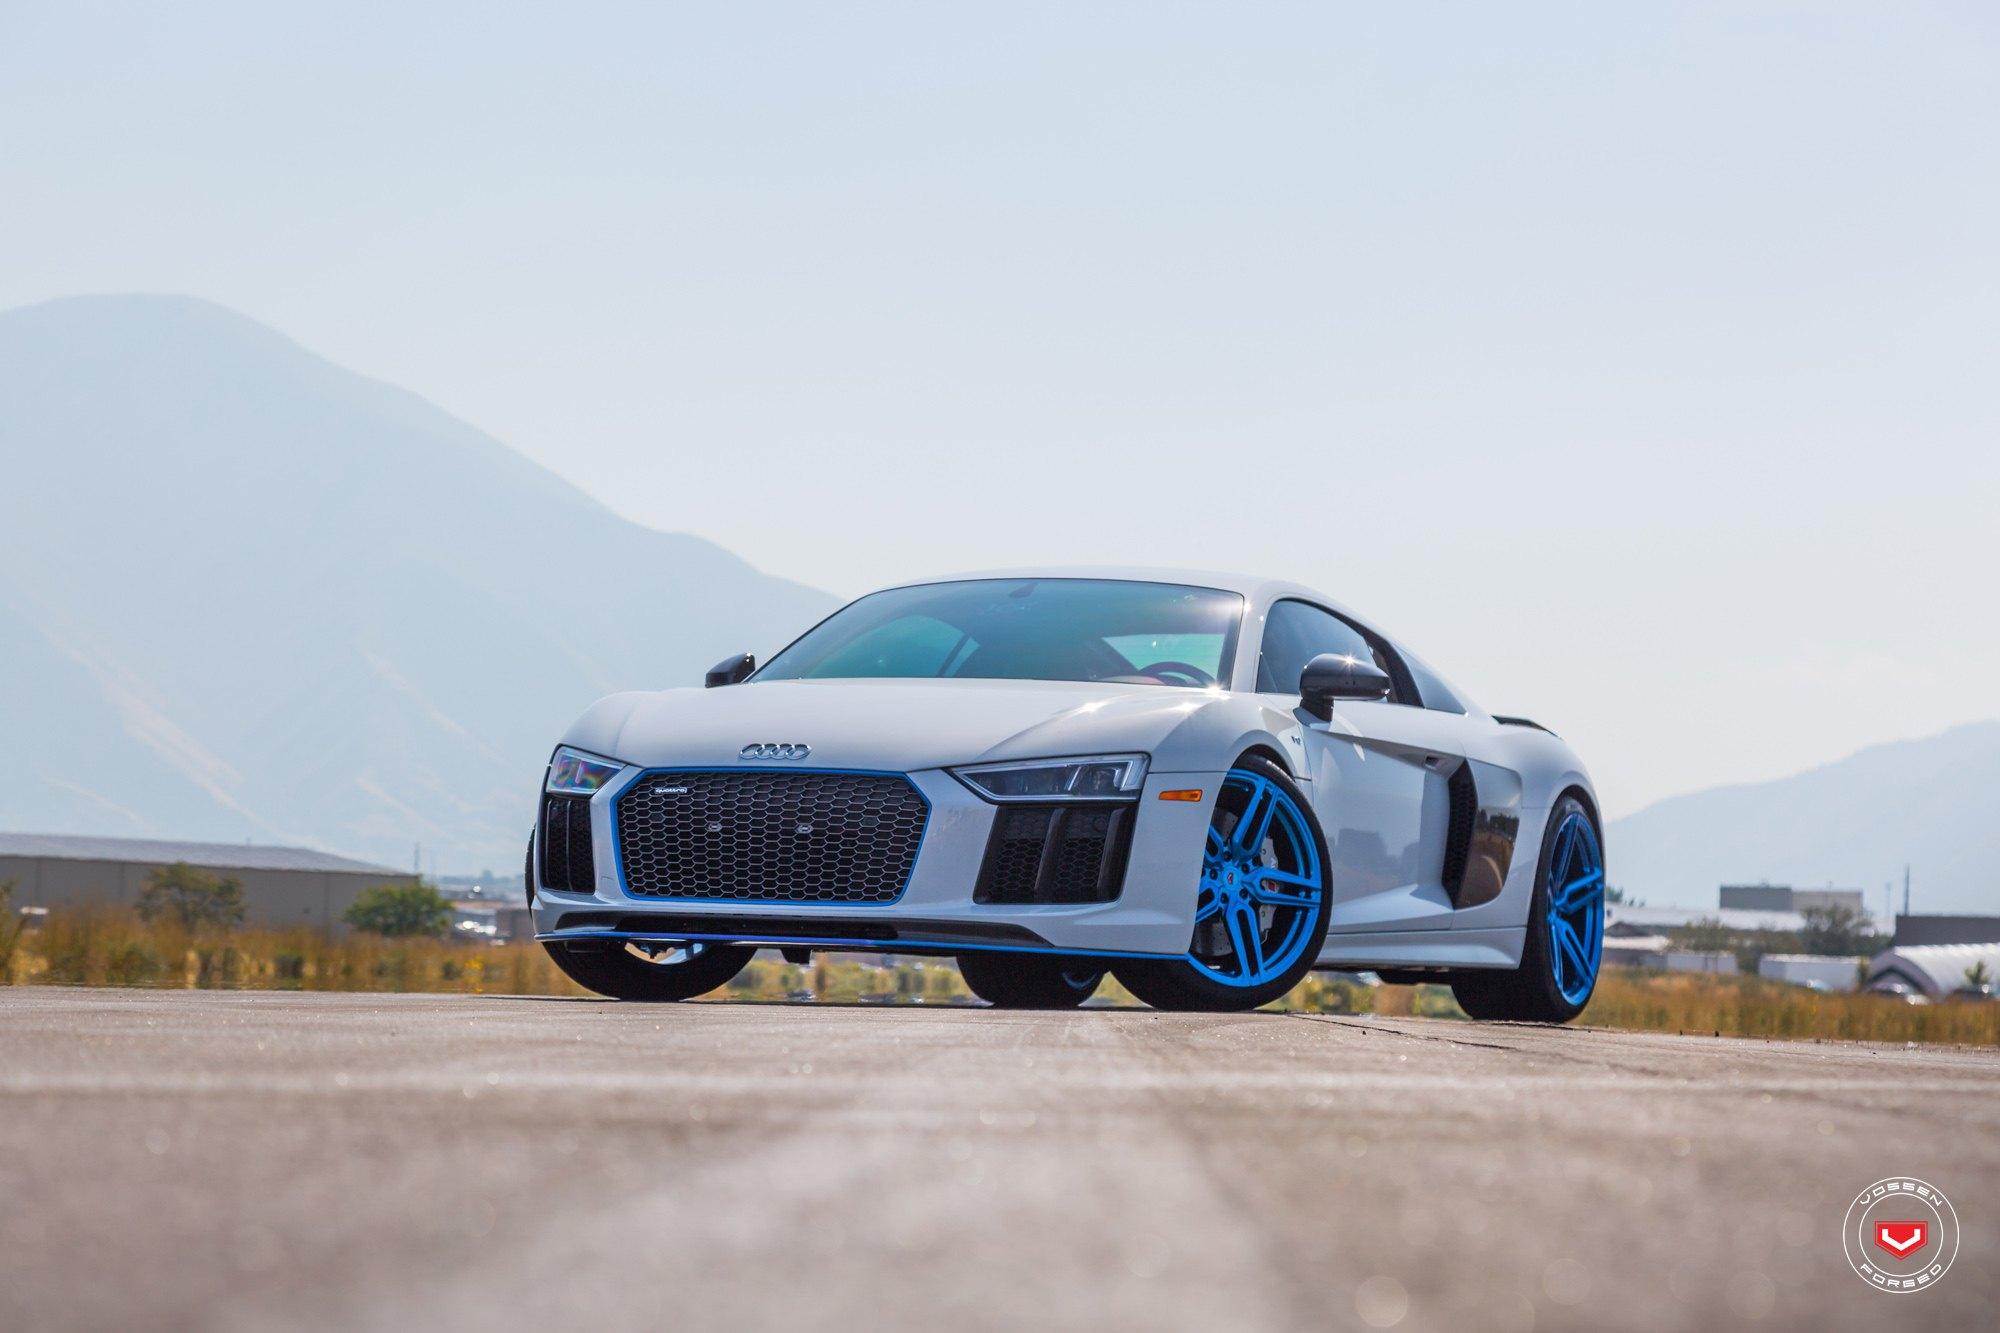 Extraordinary White Audi R Sitting On Blue Custom Rims CARiDcom - White audi r8